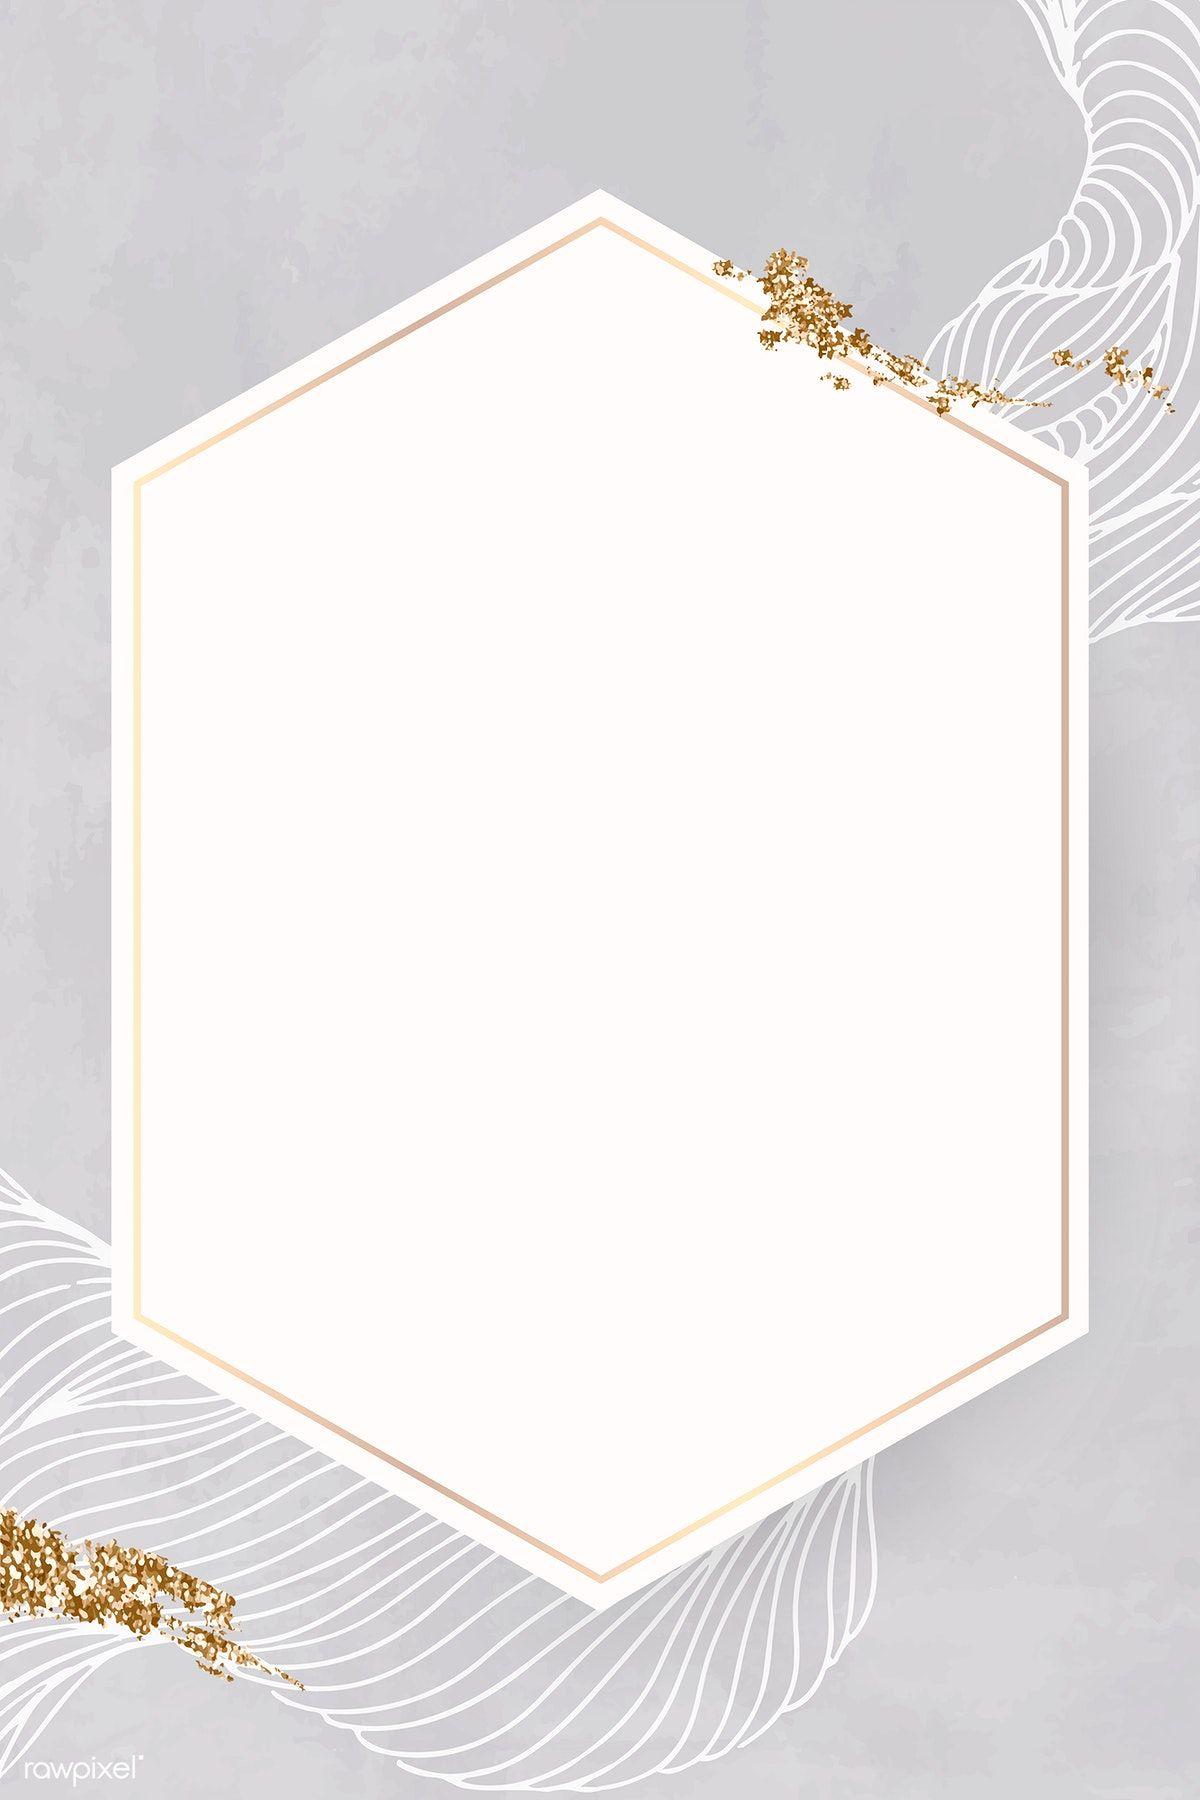 Golden Hexagon Line Frame Illustration Premium Image By Rawpixel Com Adj Vector Vectorart Digitalpainting Digit Floral Border Design Frame Design Frame